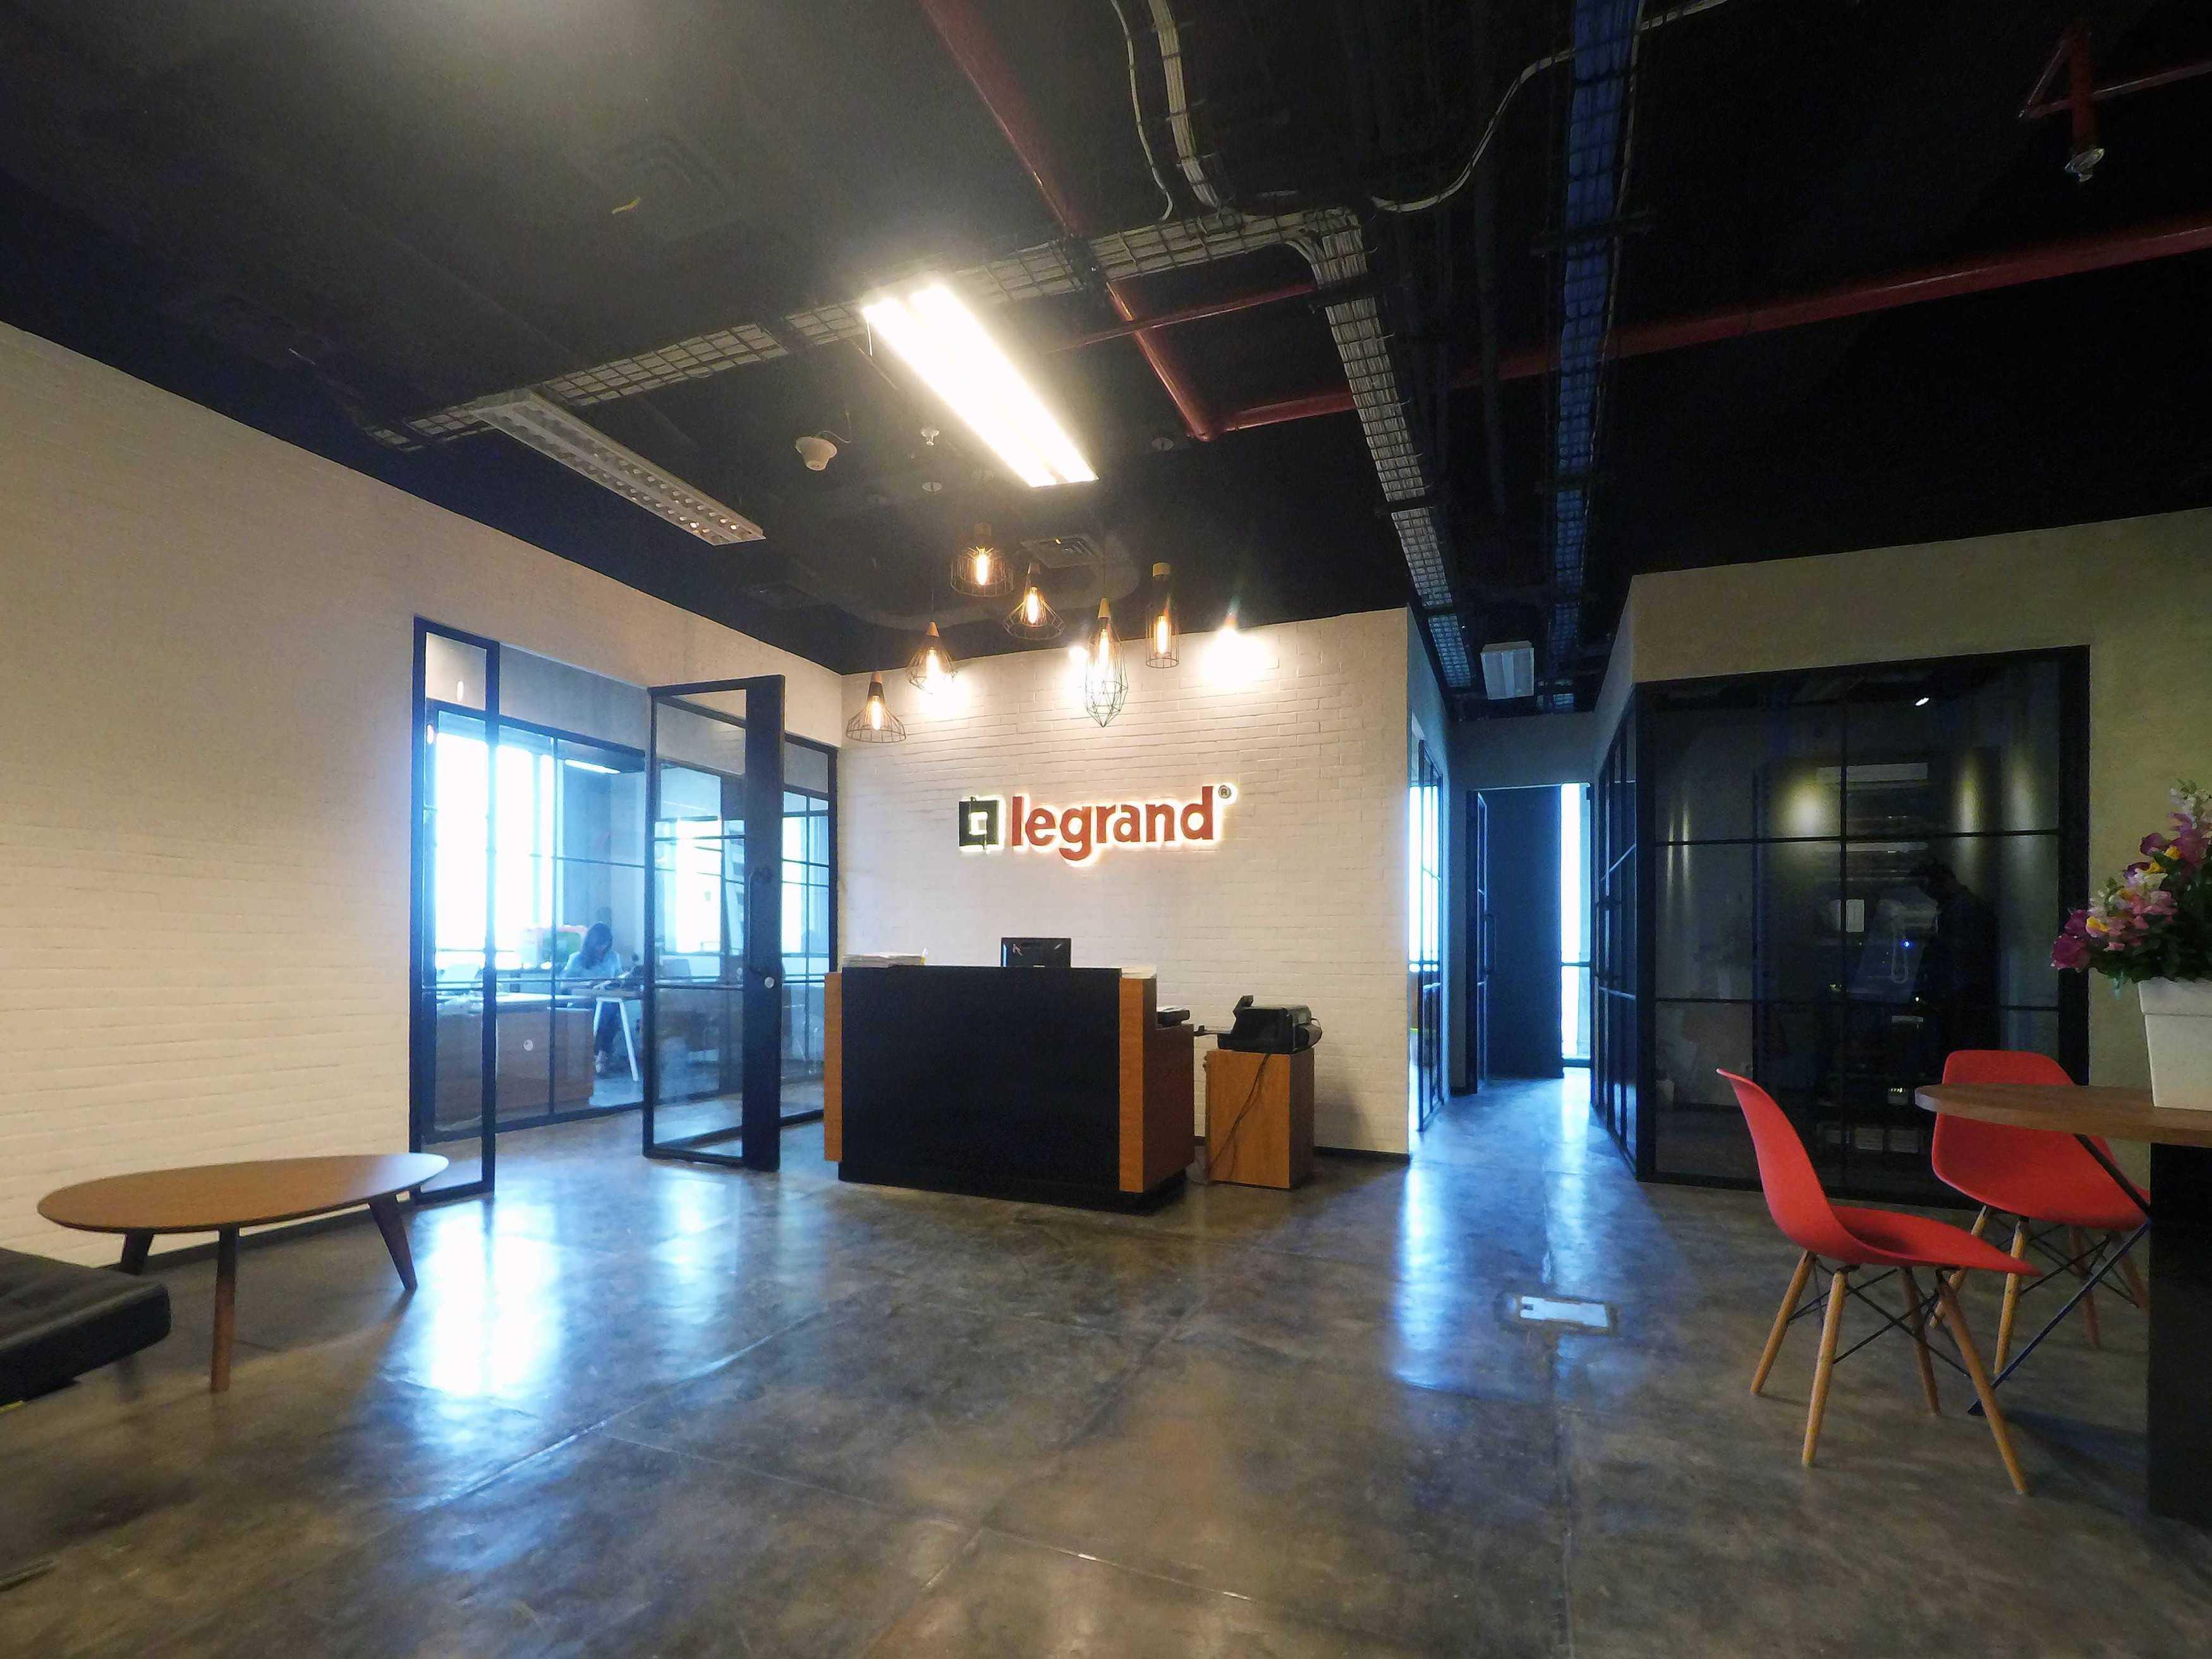 Dezan Studio Legrand Office Generali Tower, Jakarta Generali Tower, Jakarta Receptionist Industrial  14471